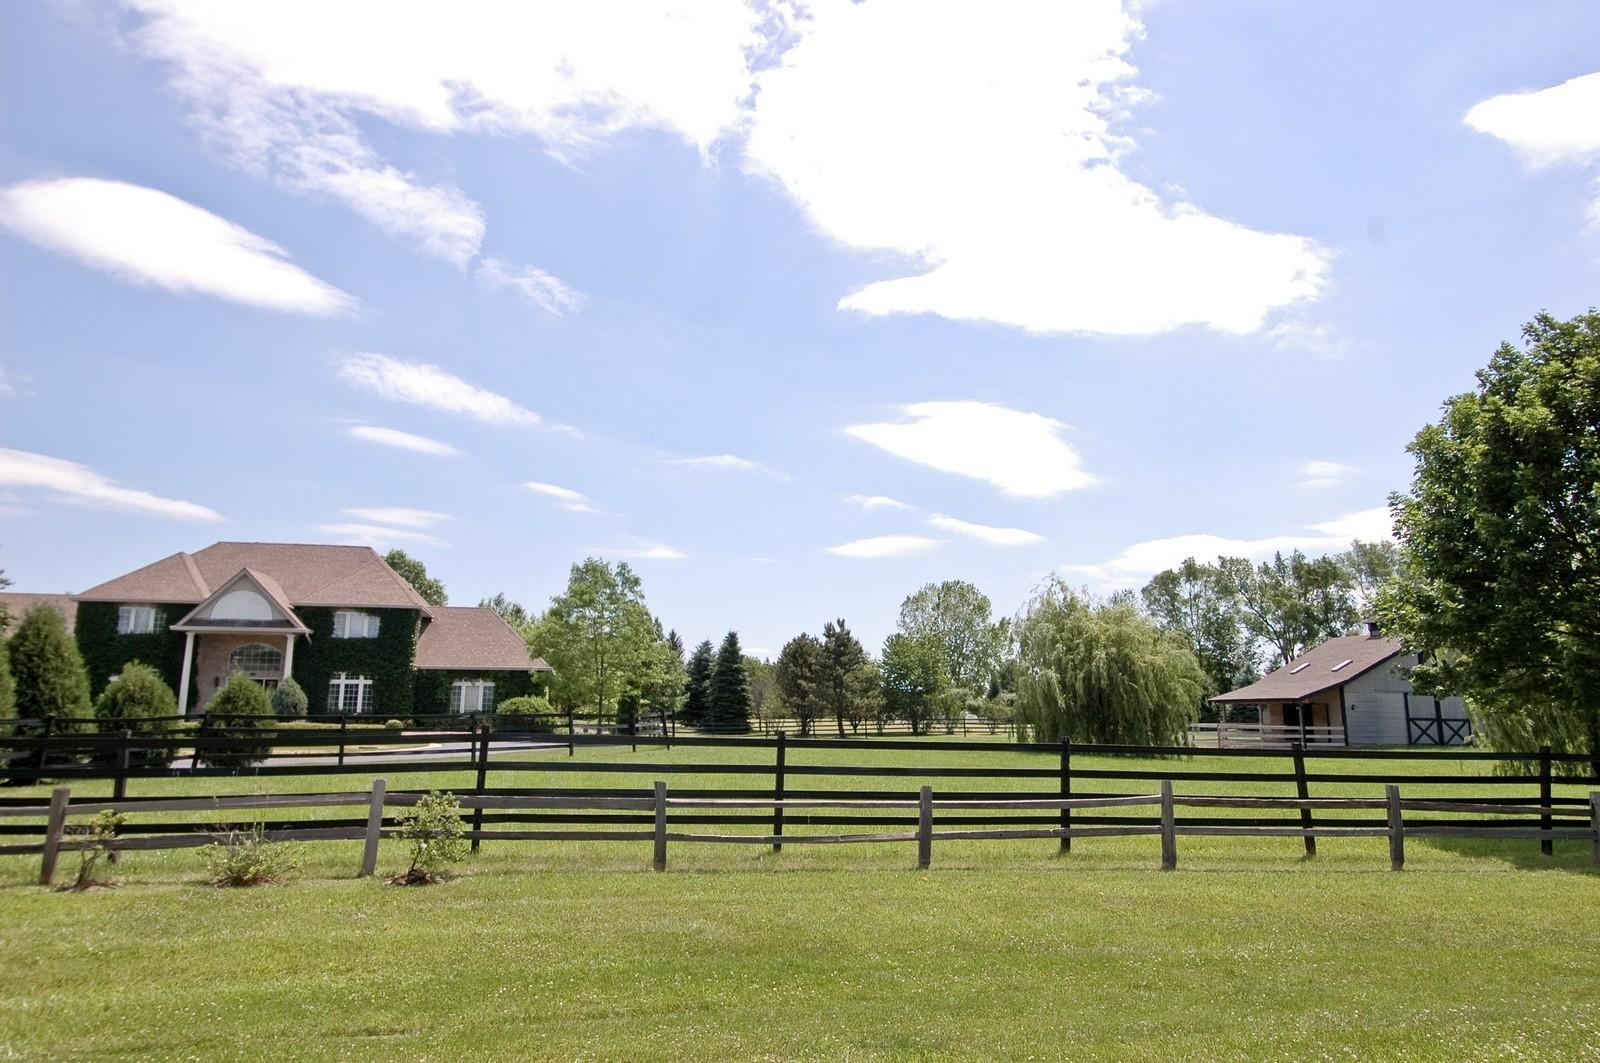 Real Estate Photography - 32W601 Rochefort, Wayne, IL, 60184 - House, Barn